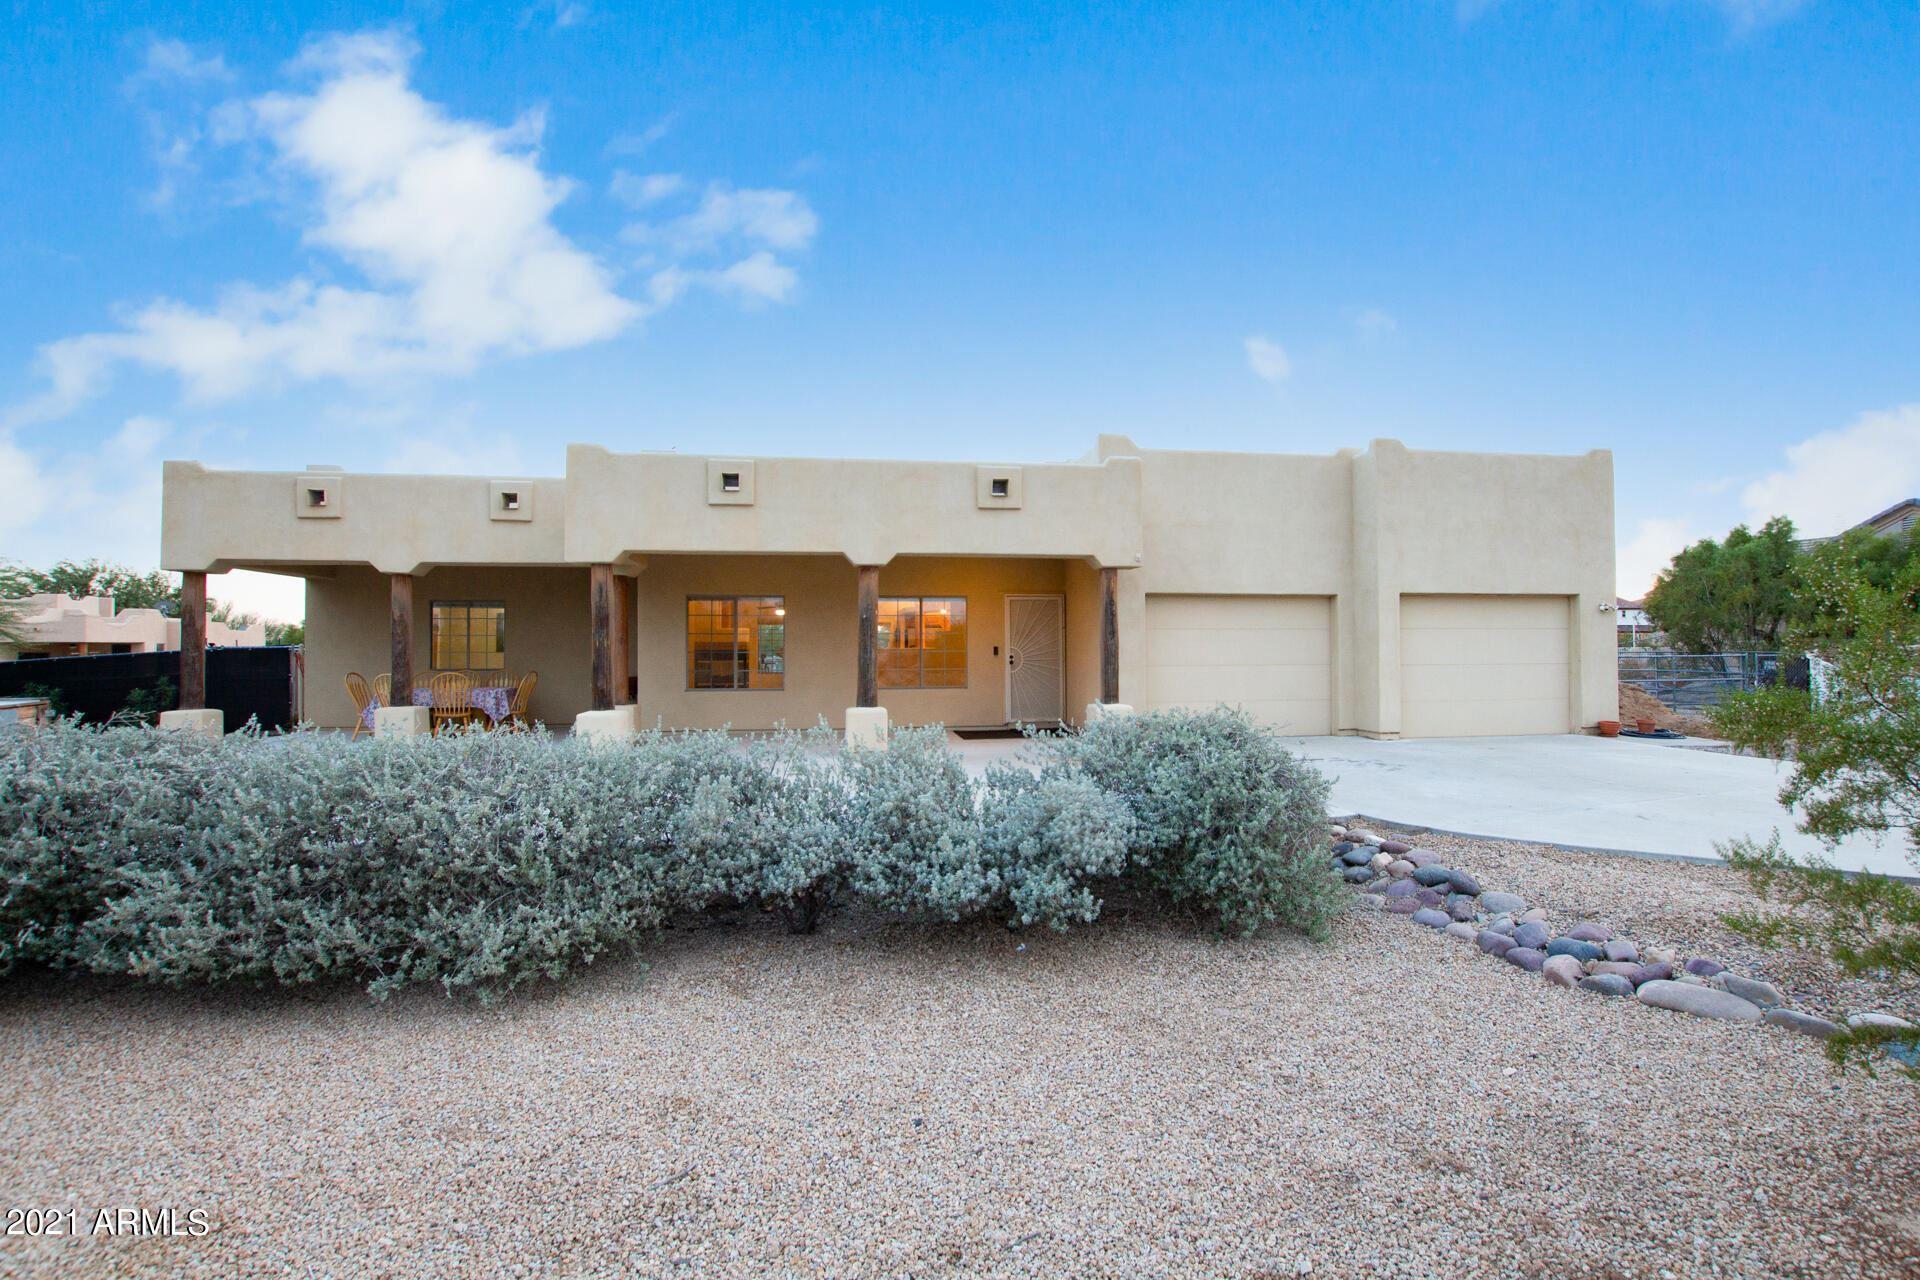 Photo of 19519 W MINNEZONA Avenue, Litchfield Park, AZ 85340 (MLS # 6301557)